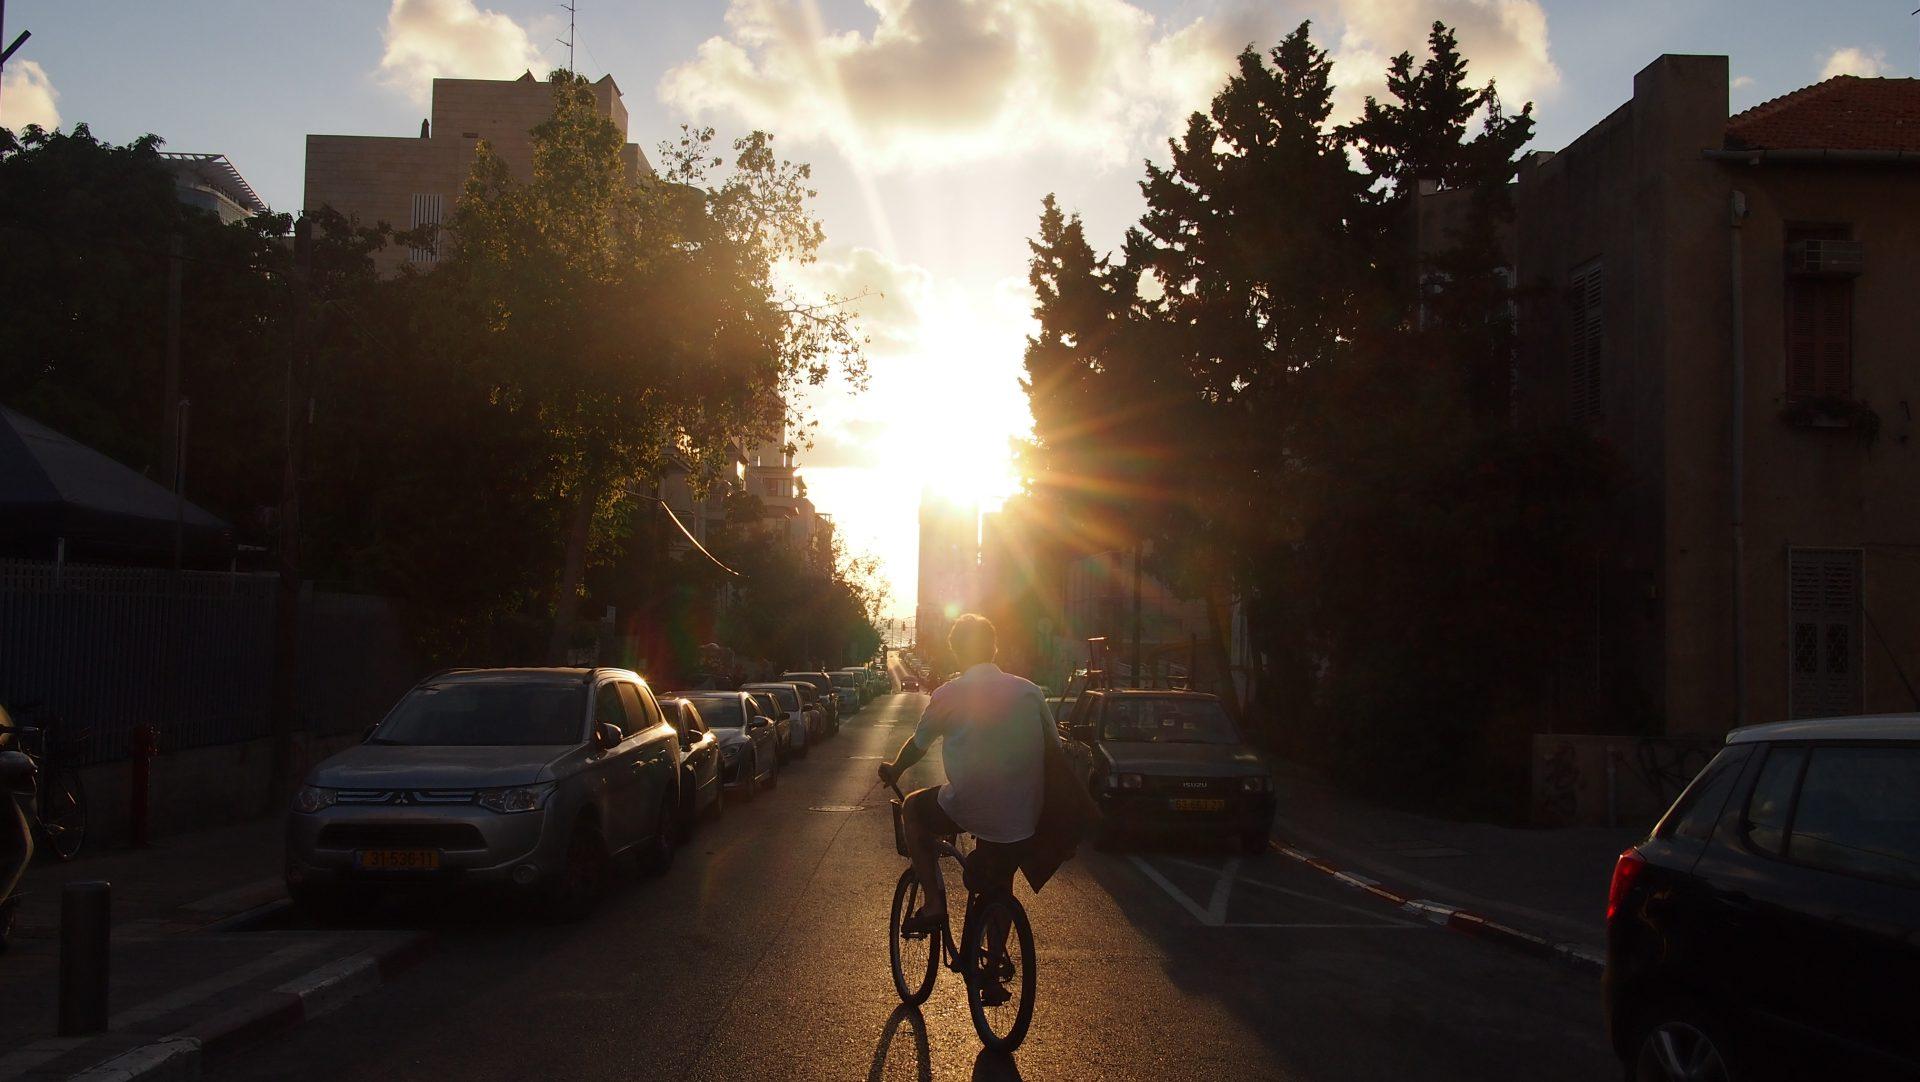 Exploring Tel Aviv by bike